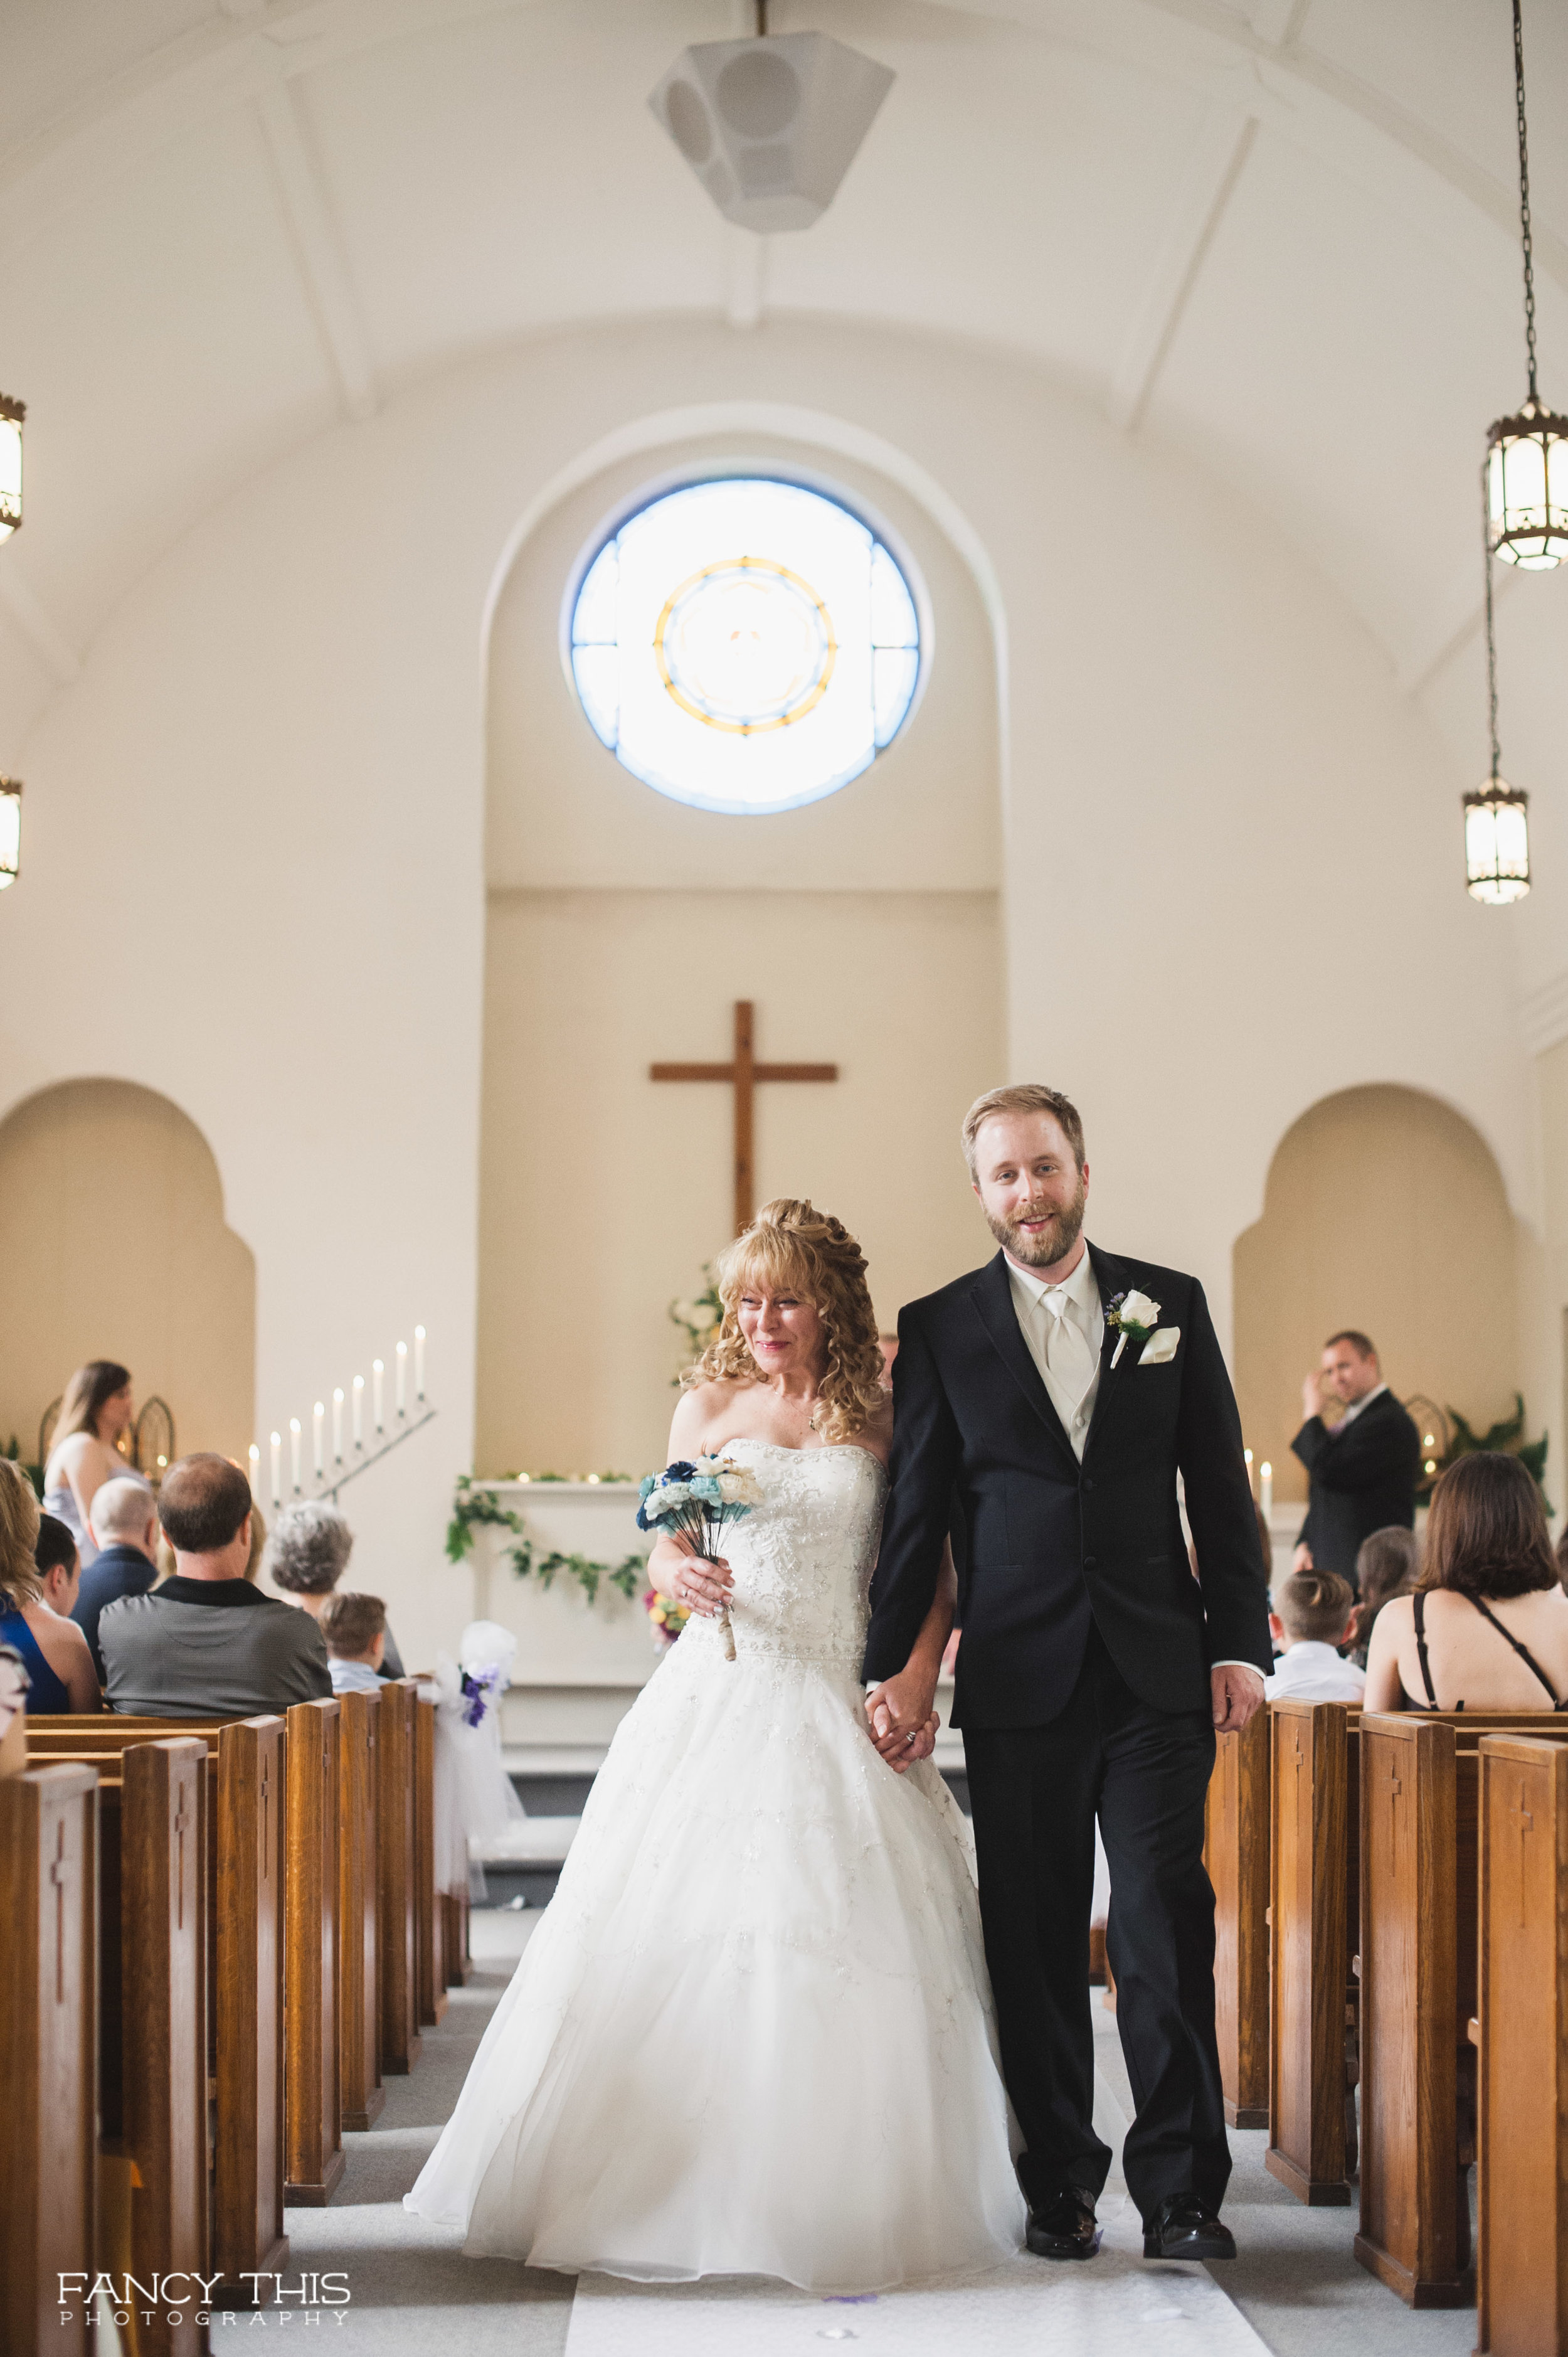 courtneyjasonwedding_socialmediaready125.jpg